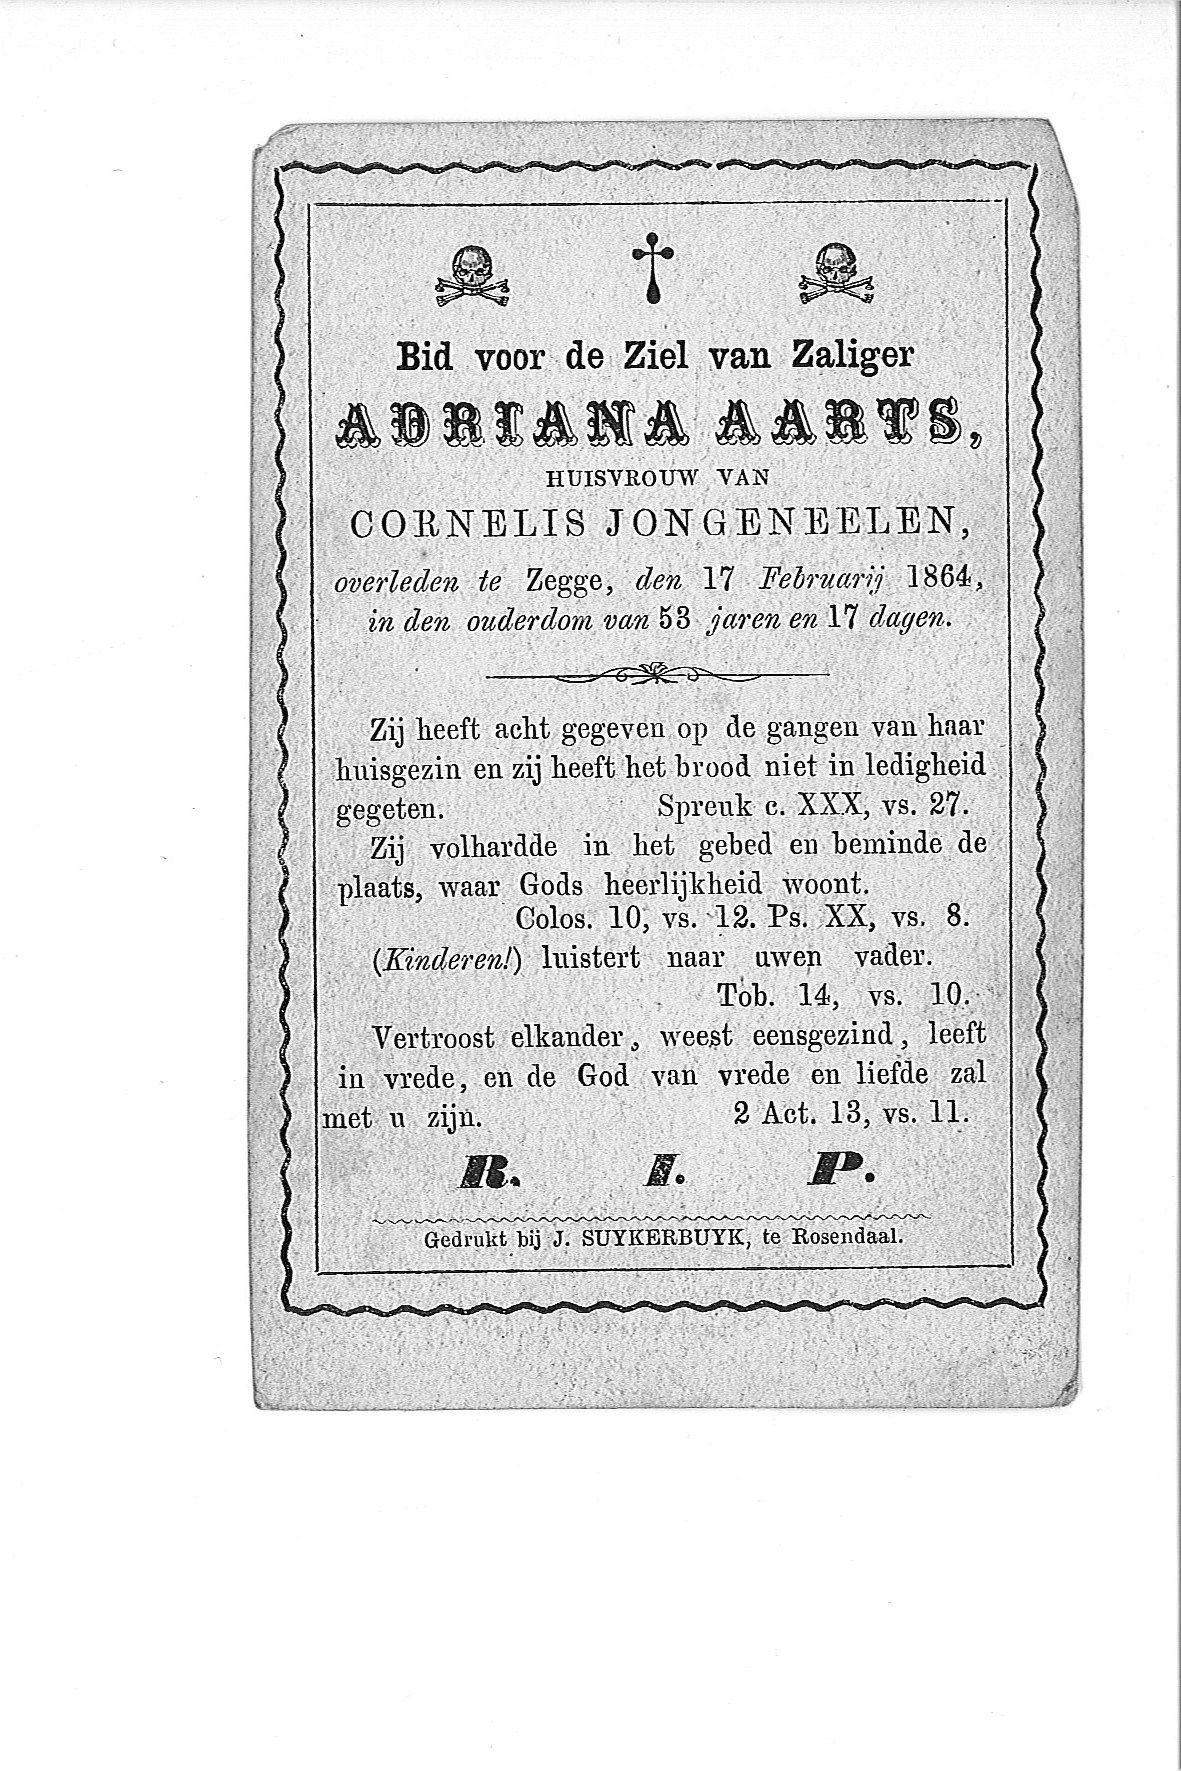 adriana(1864)20081128093120_00005.jpg